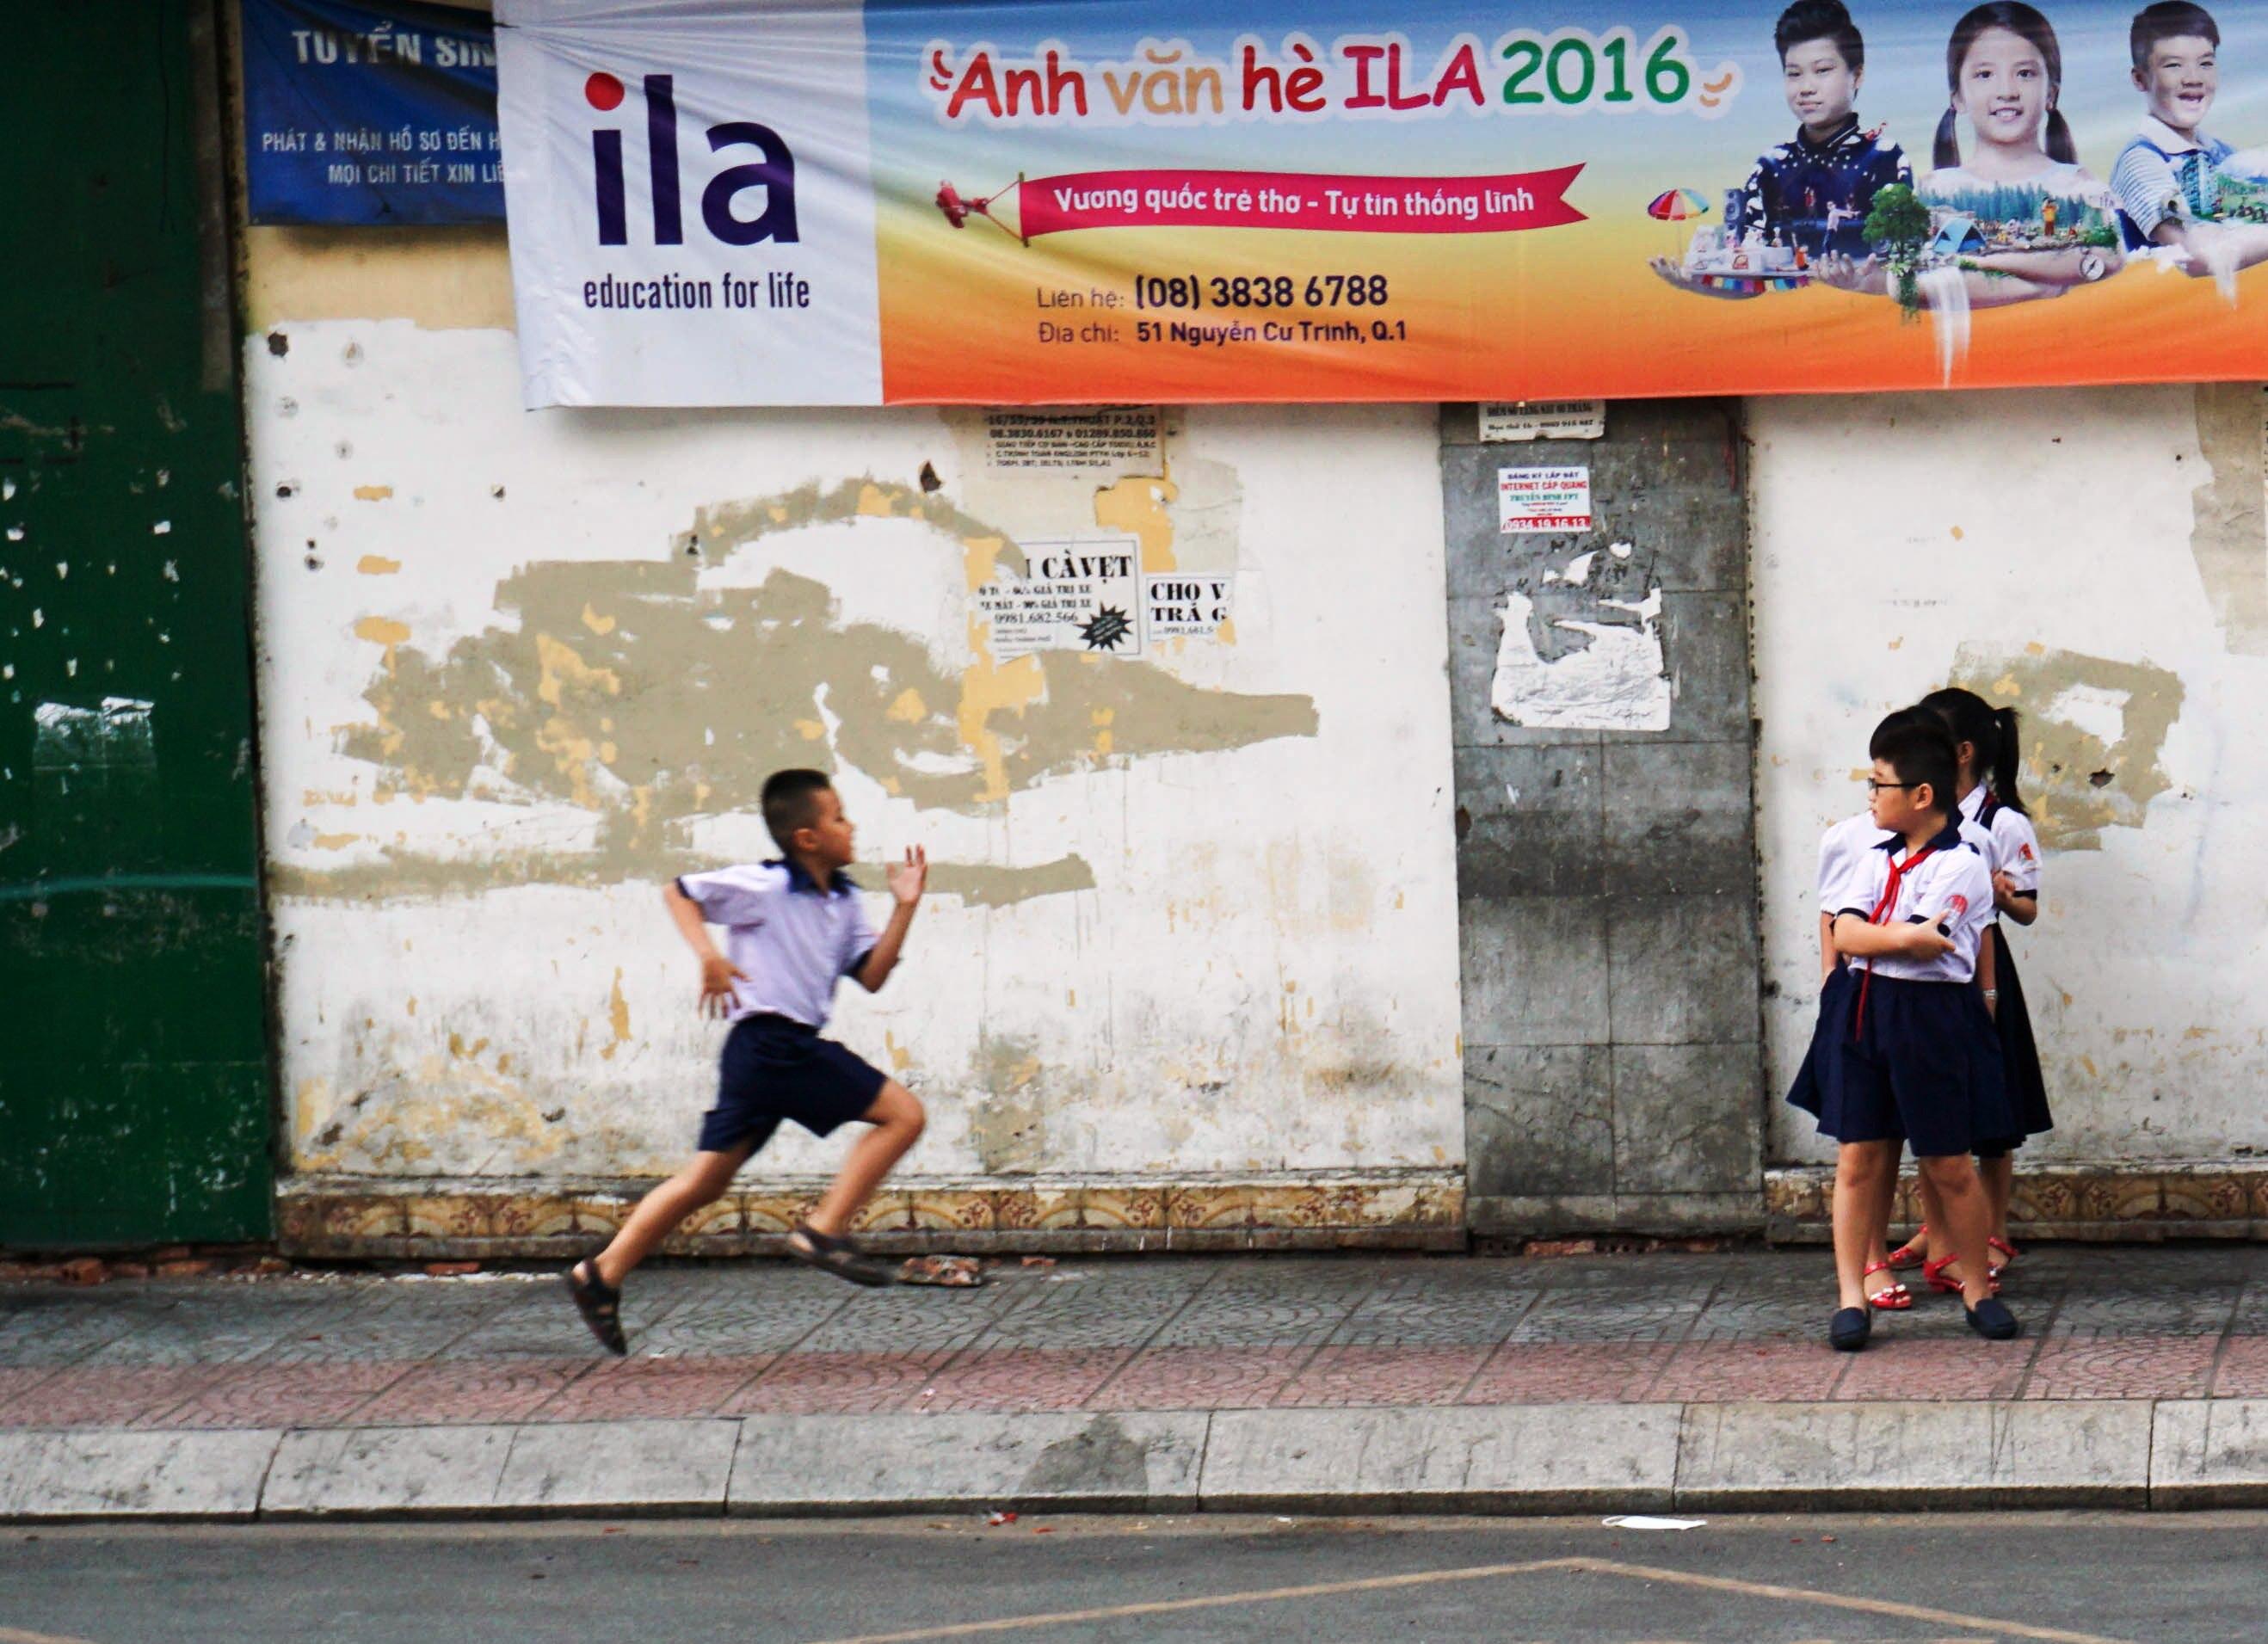 School Children in Ho Chi Minh City, Vietnam, April 2016